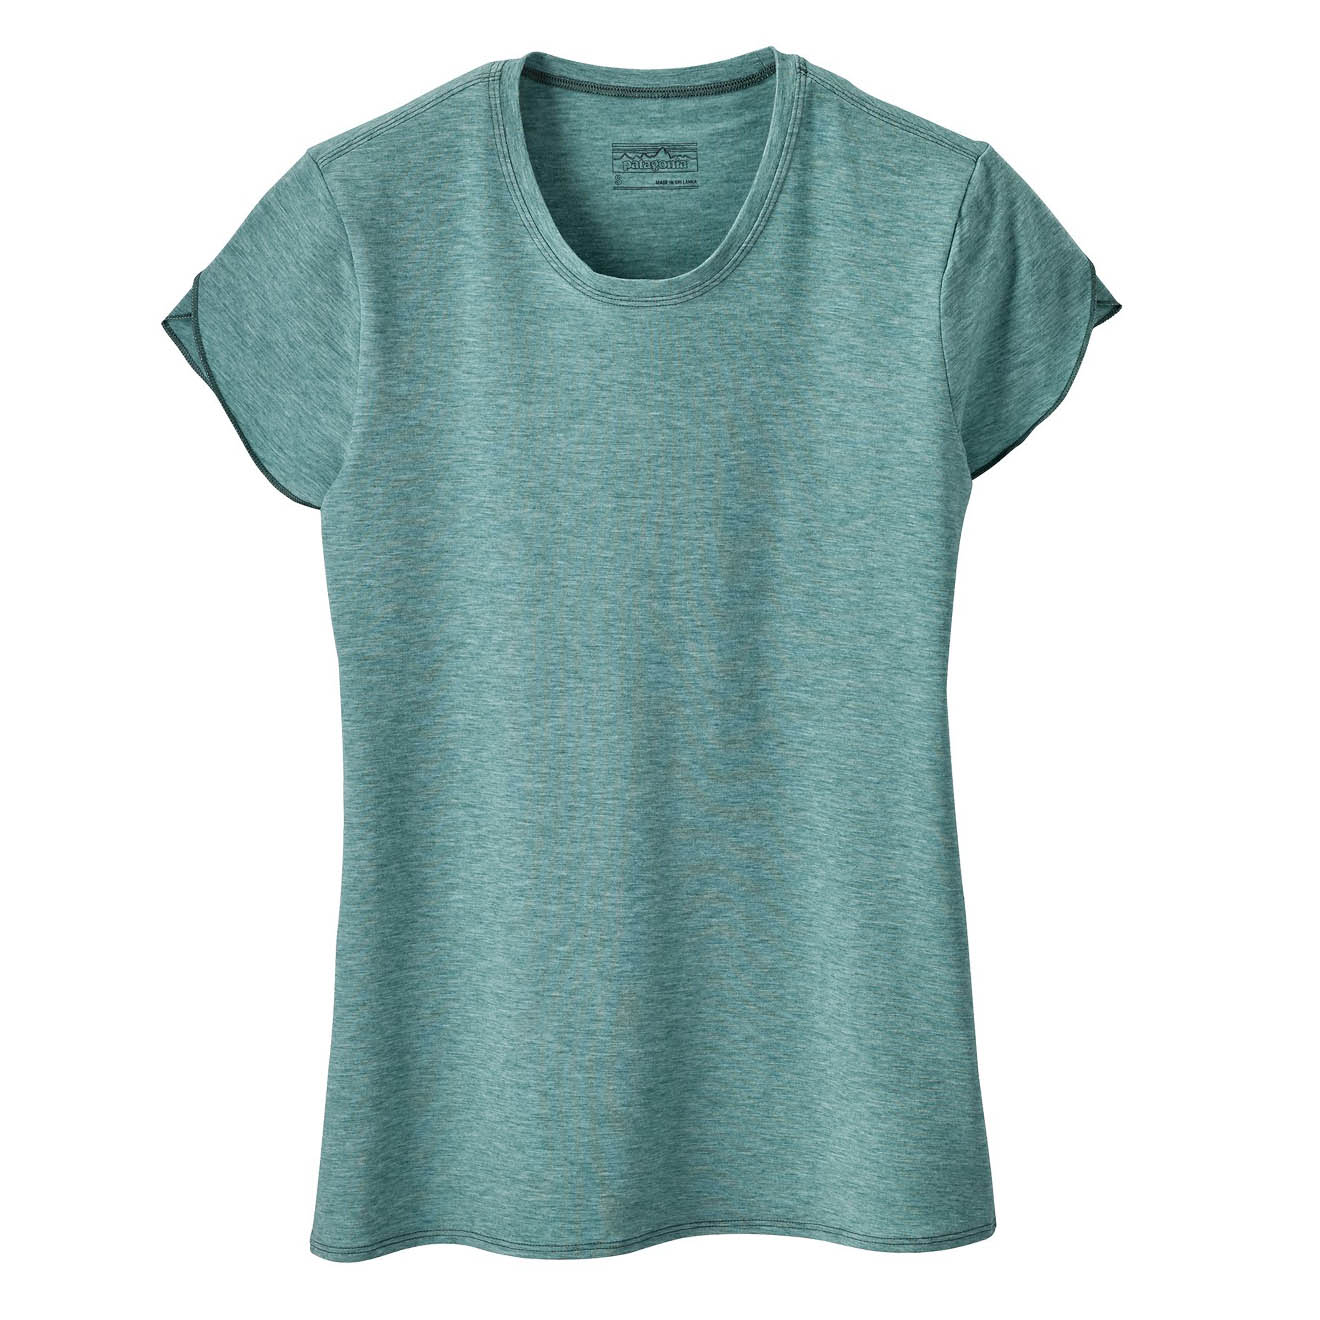 Patagonia Womens Glorya T-Shirt Beryl Green